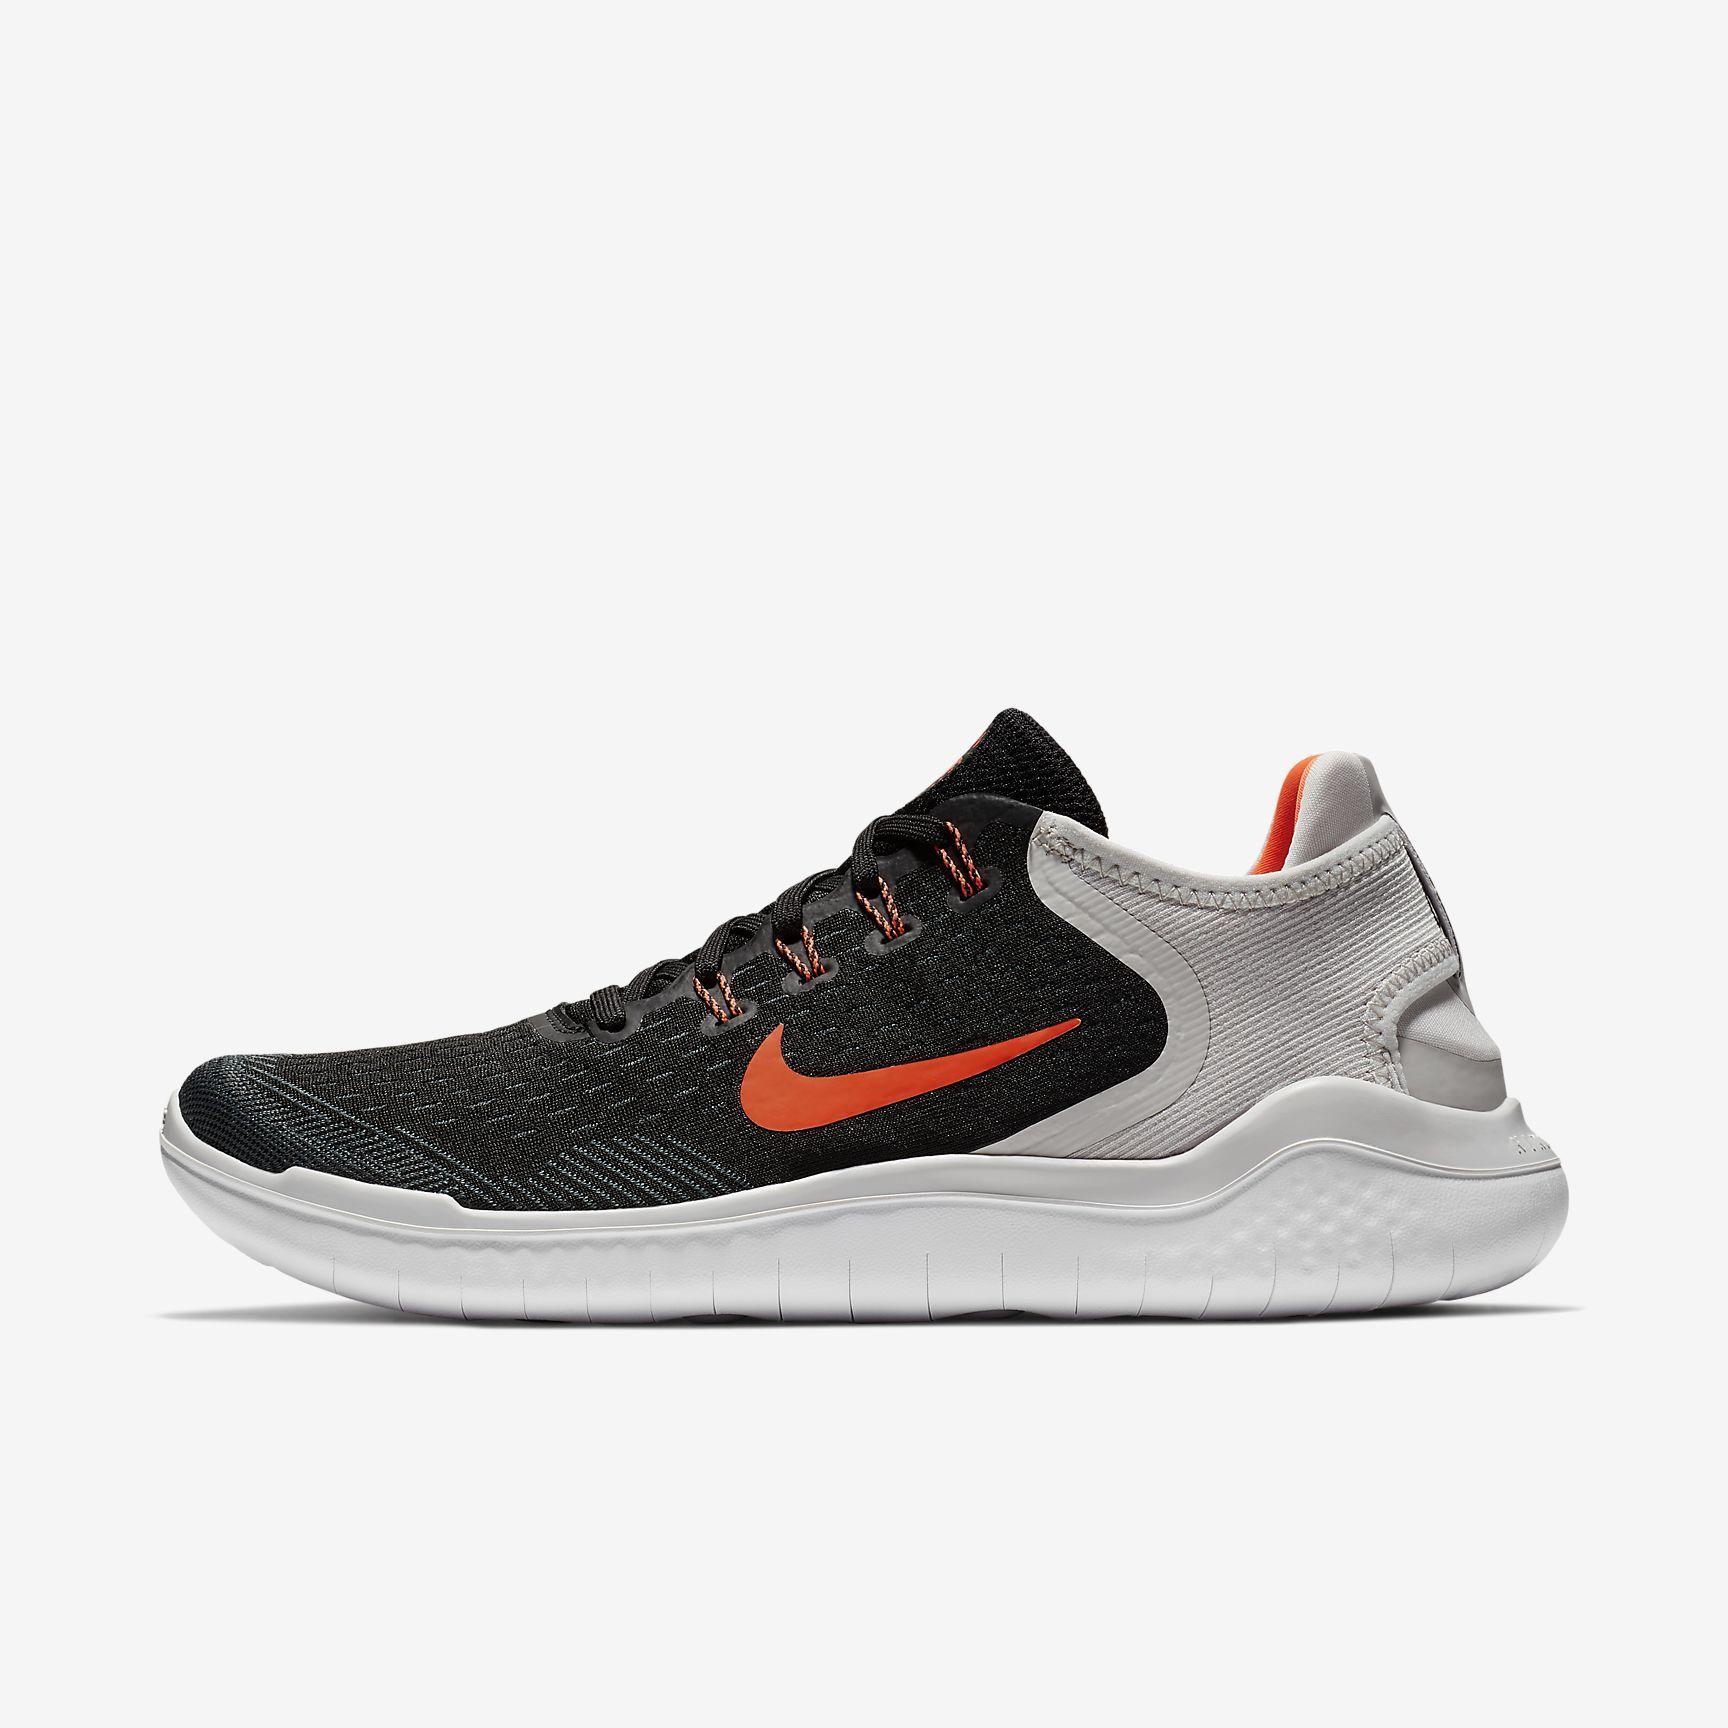 18cd0eea4f07e Nike Free RN 2018 Men s Running Shoe Pinterest    Aboodi nixon ...